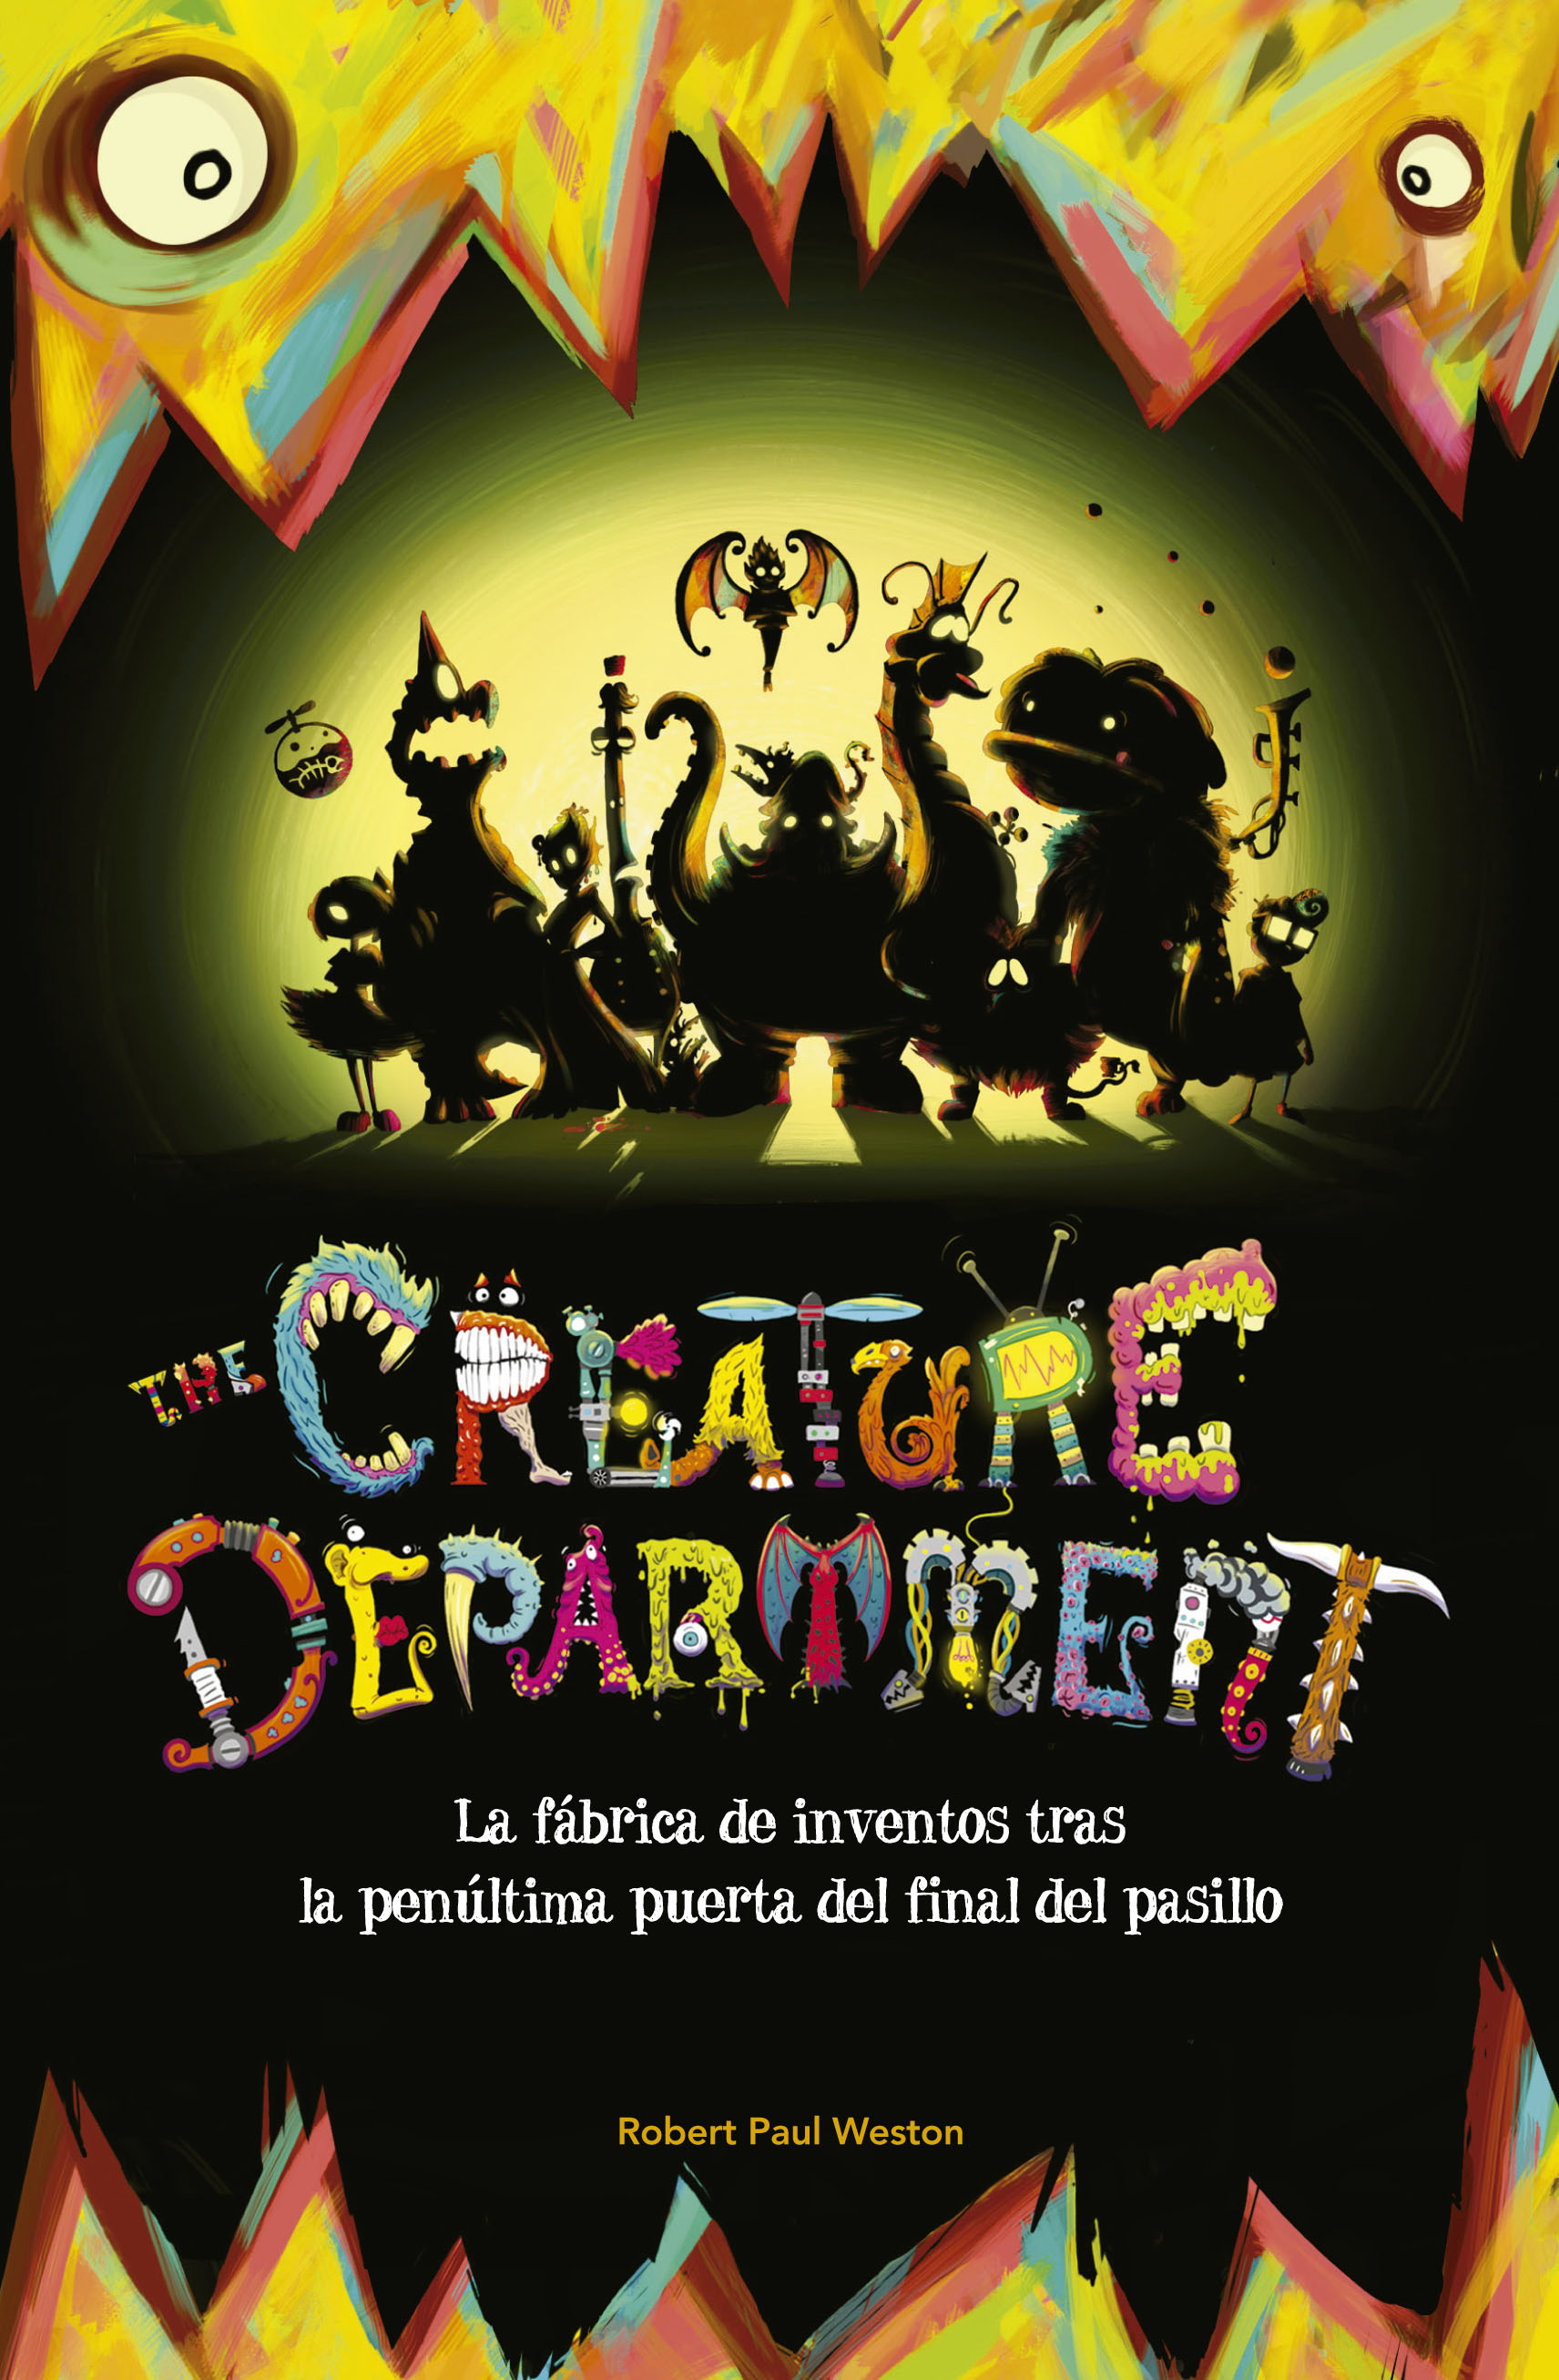 portada-the-creature-department-fabrica-inventos-tras-penultima-puerta-final-pasillo